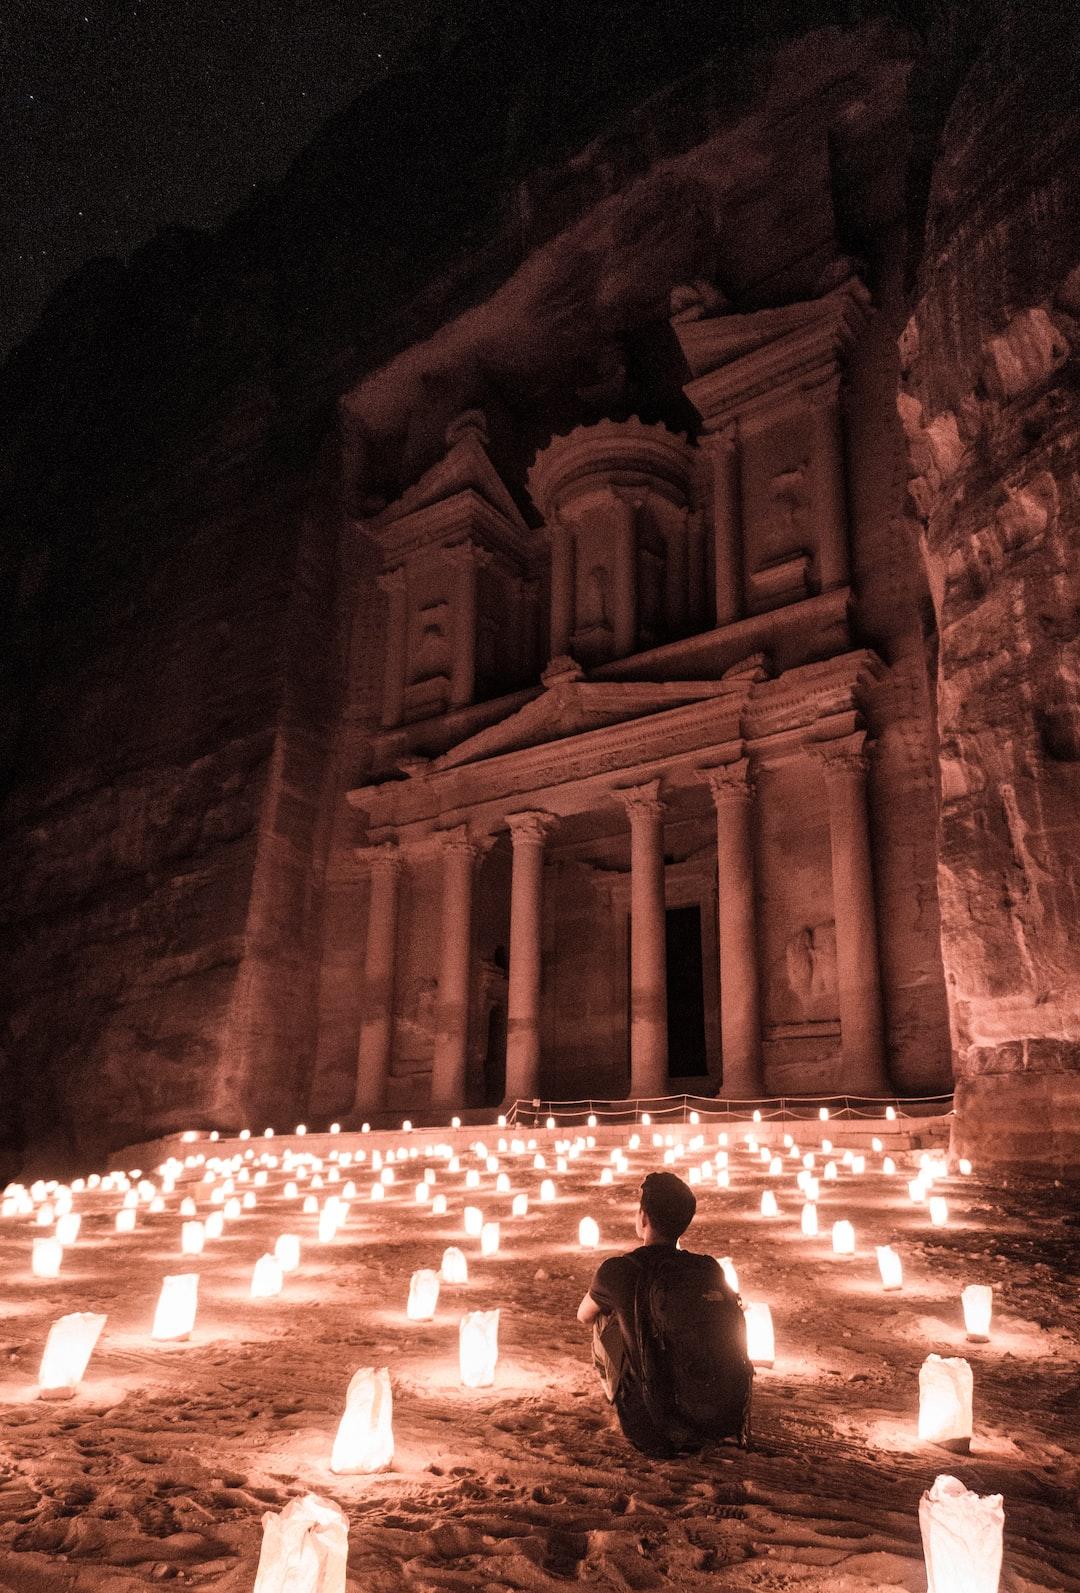 Jordan at Night